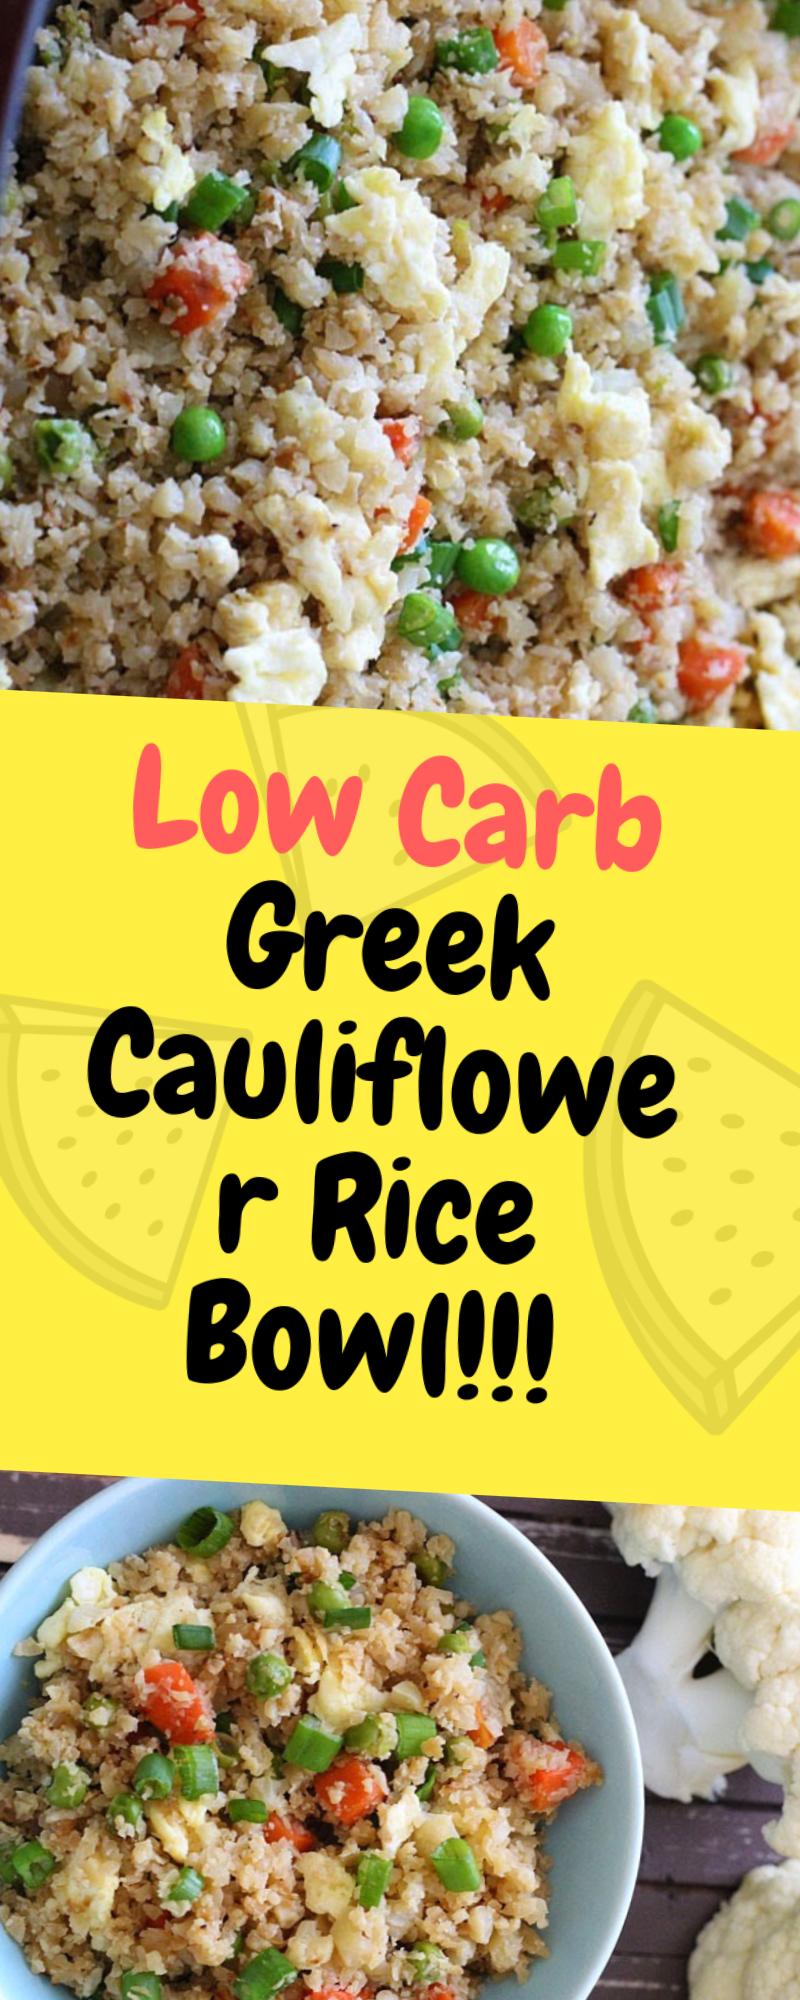 Low Carb Greek Cauliflower Rice Bowl Rice Bowls Food Low Carb